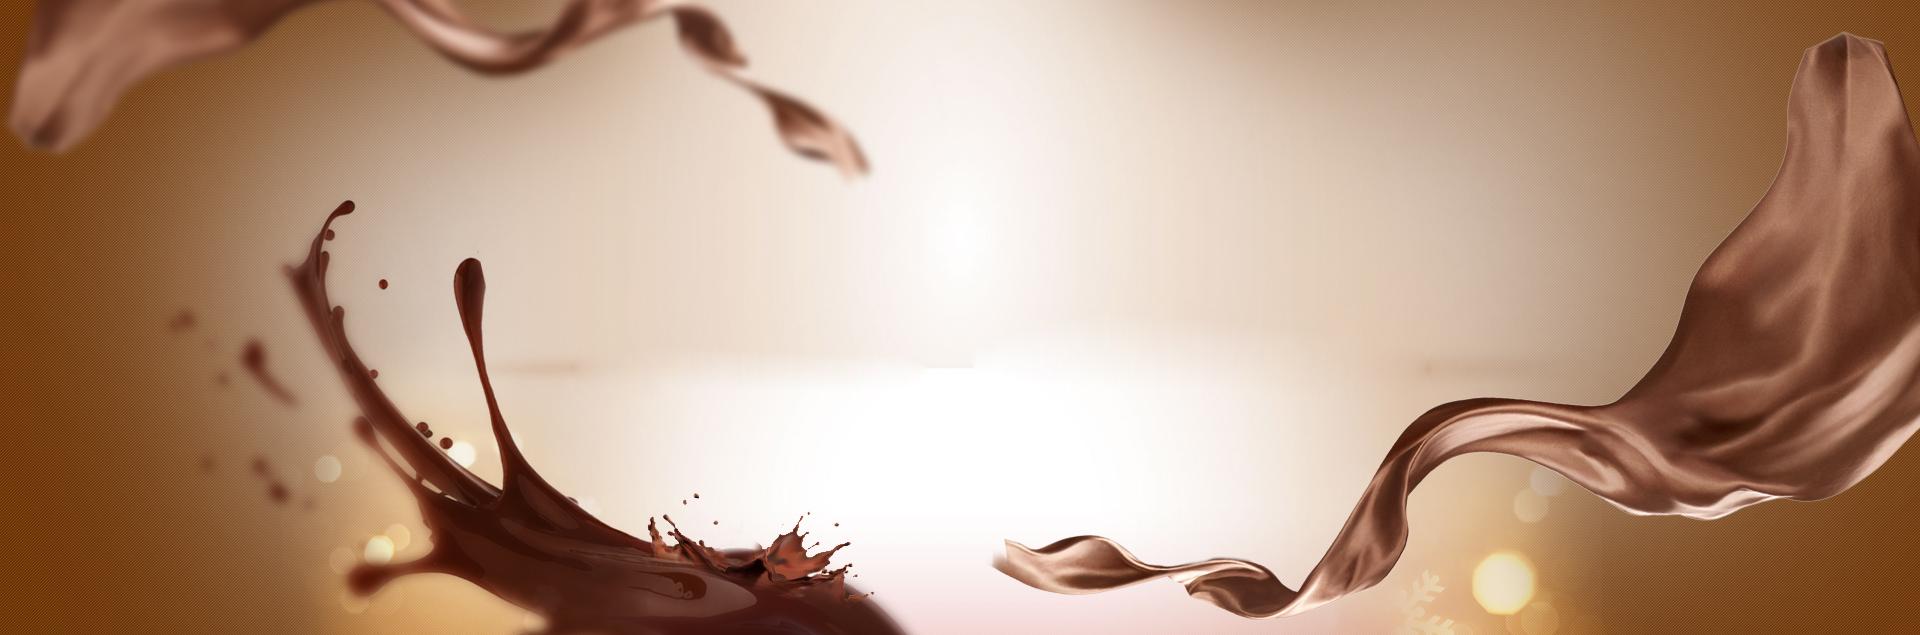 White Chocolate Background Wallpaper